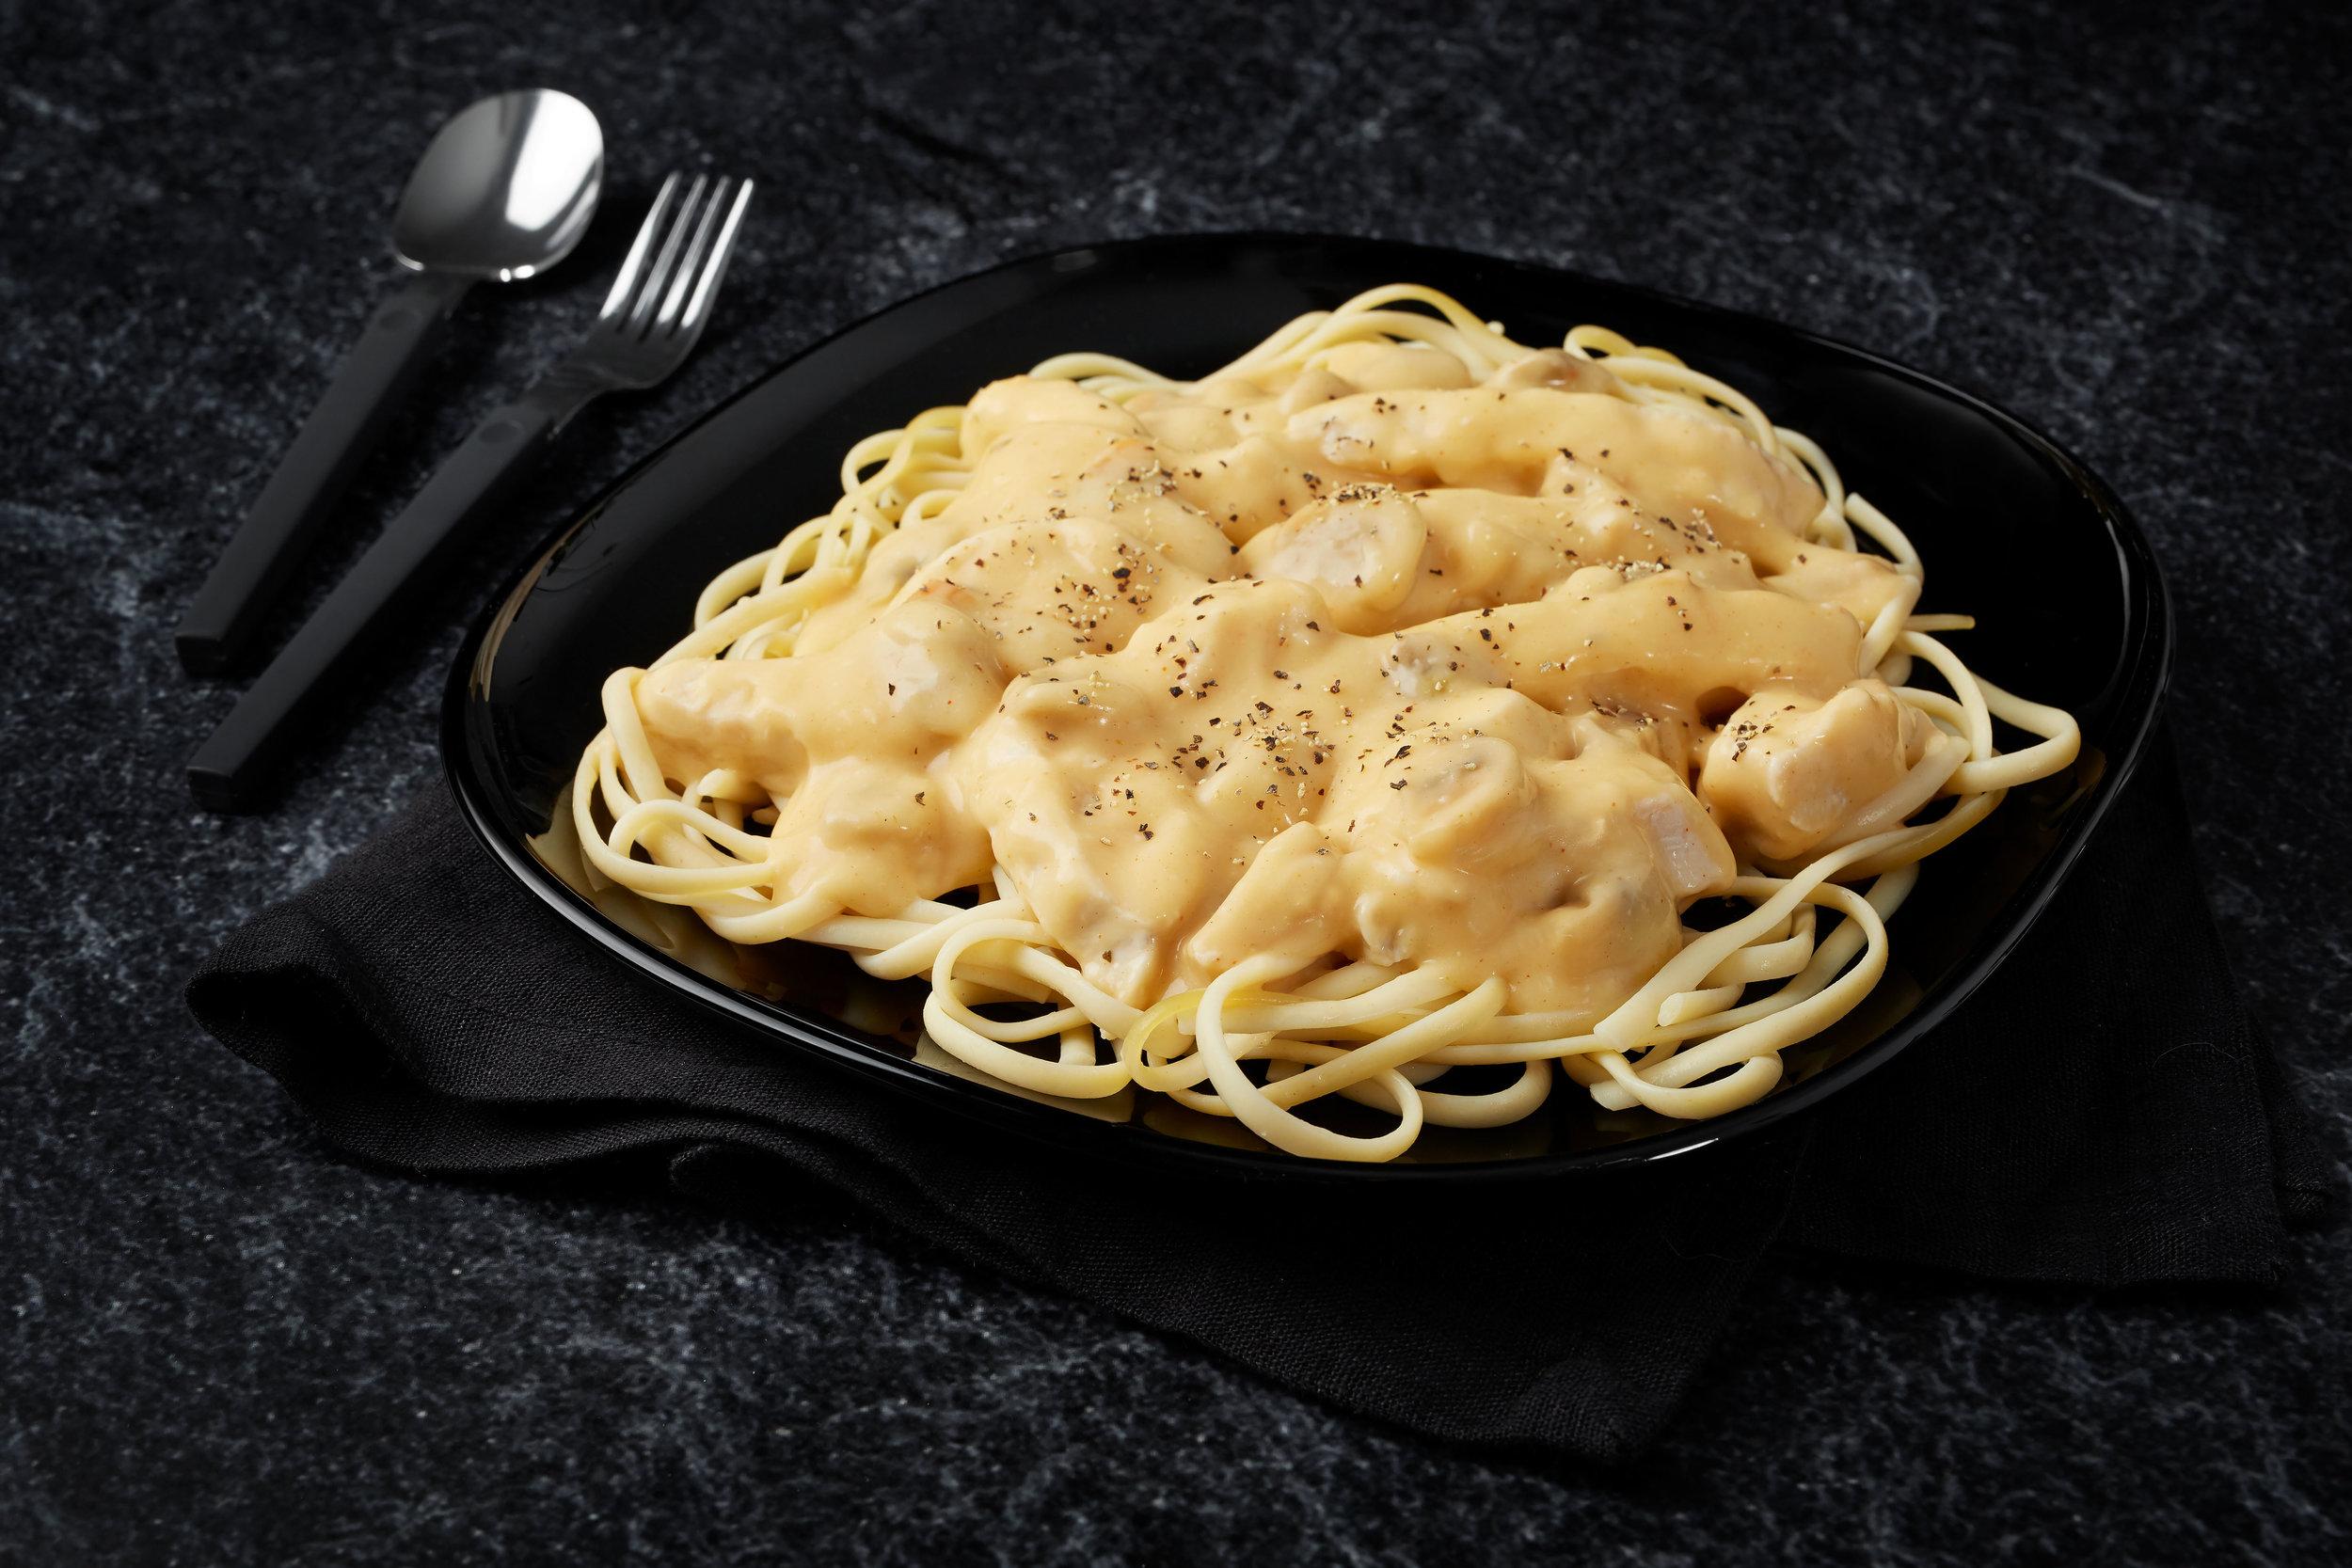 Chicken-and-mushroom-linguine.jpg